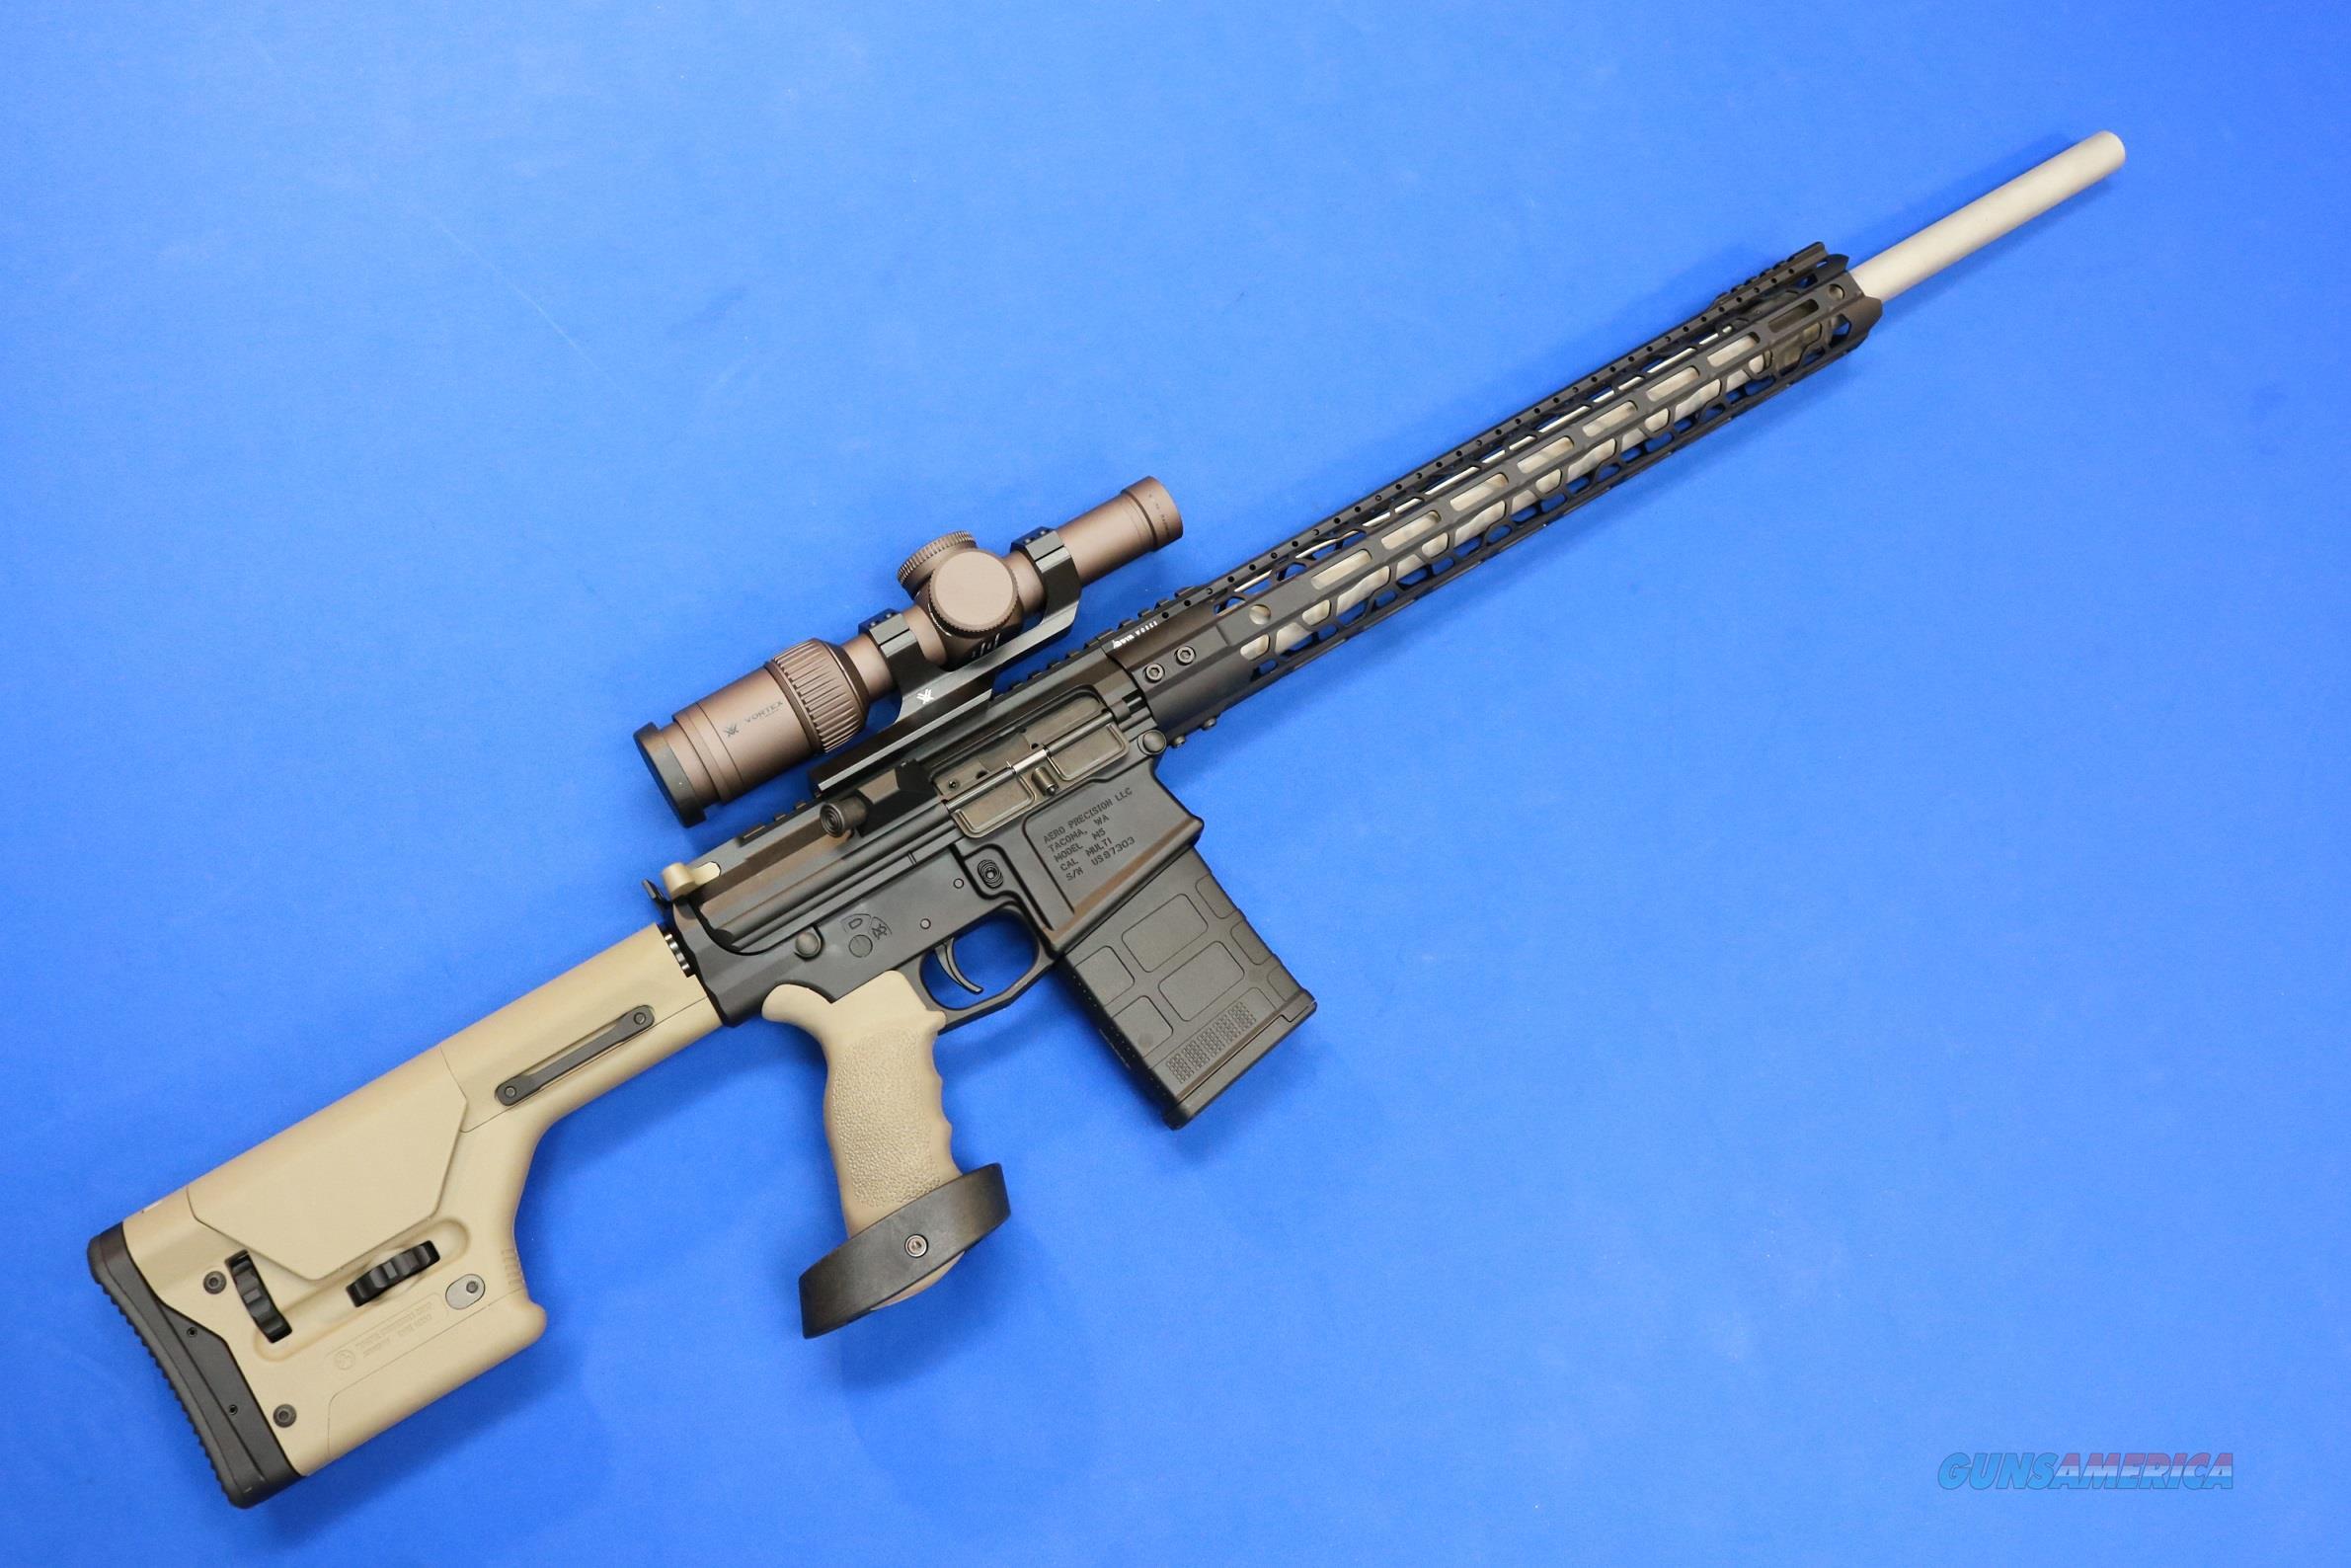 AERO PRECISION M5 CUSTOM HBAR SS 6.5 CREEDMOOR  Guns > Rifles > Aero Precision > Aero Precision Rifles